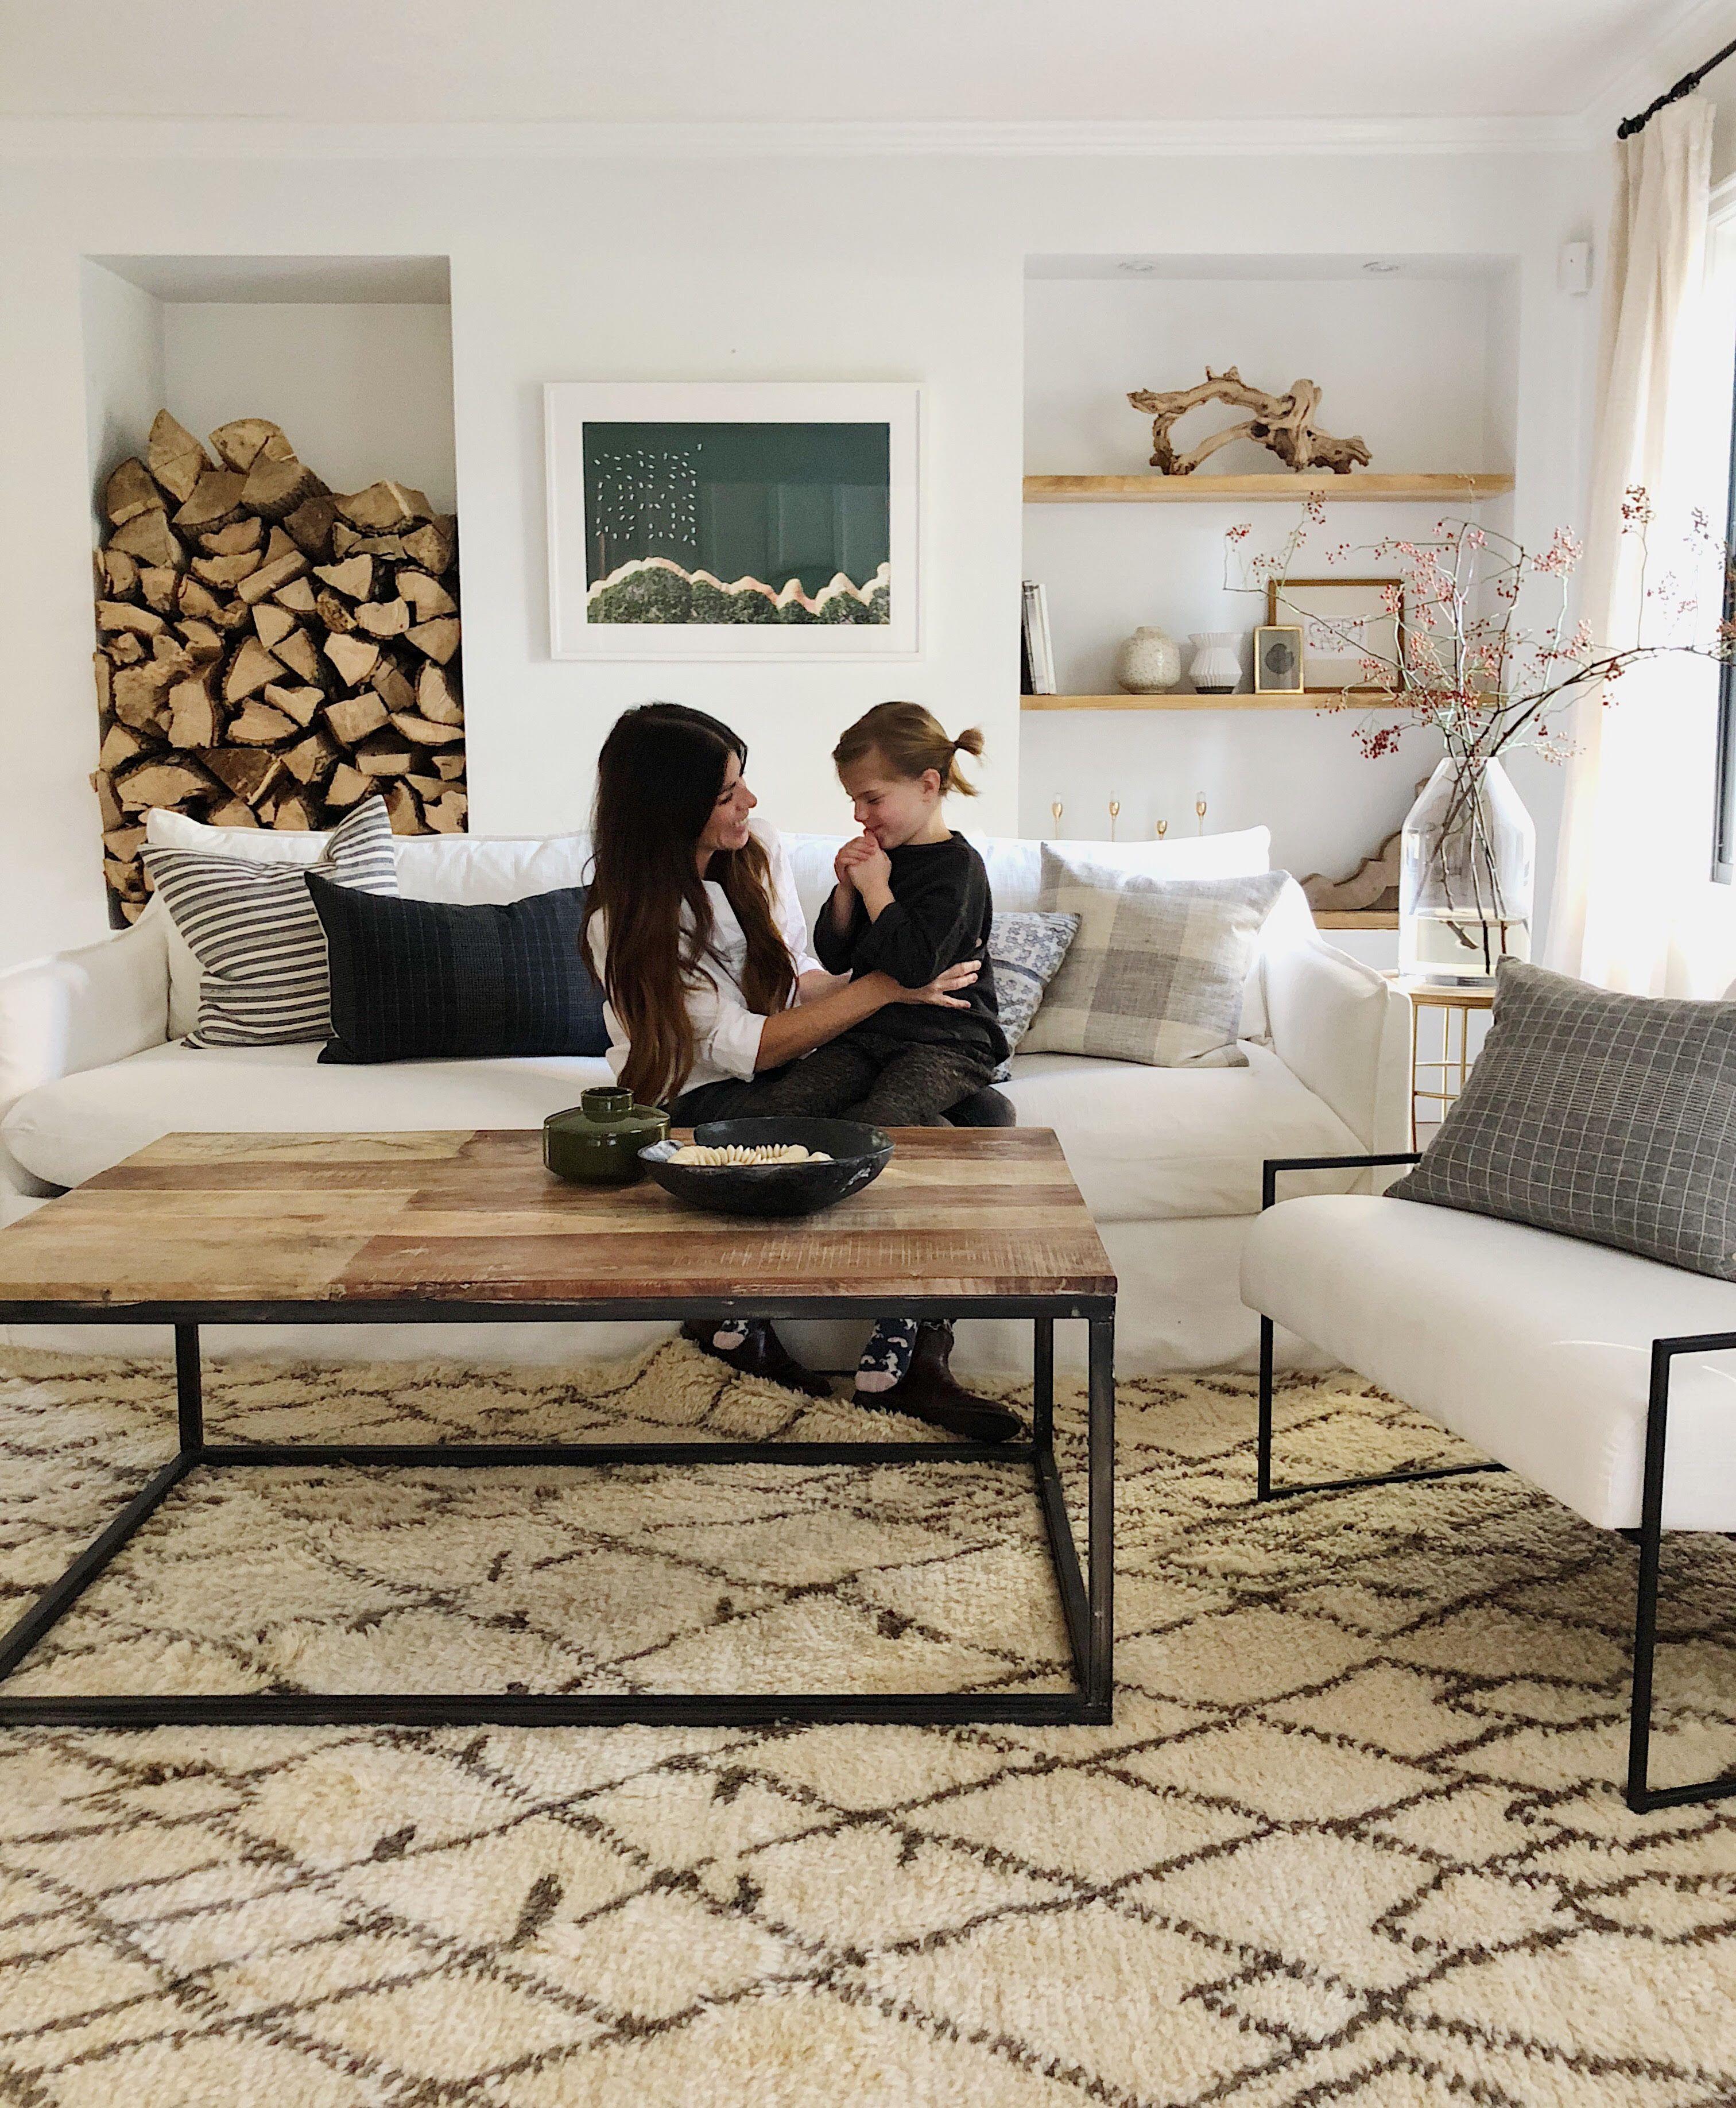 Home Tour A Rustic Modern Living Room Makeover Family Room Design Modern Rustic Living Room Small Room Design [ 3672 x 3024 Pixel ]